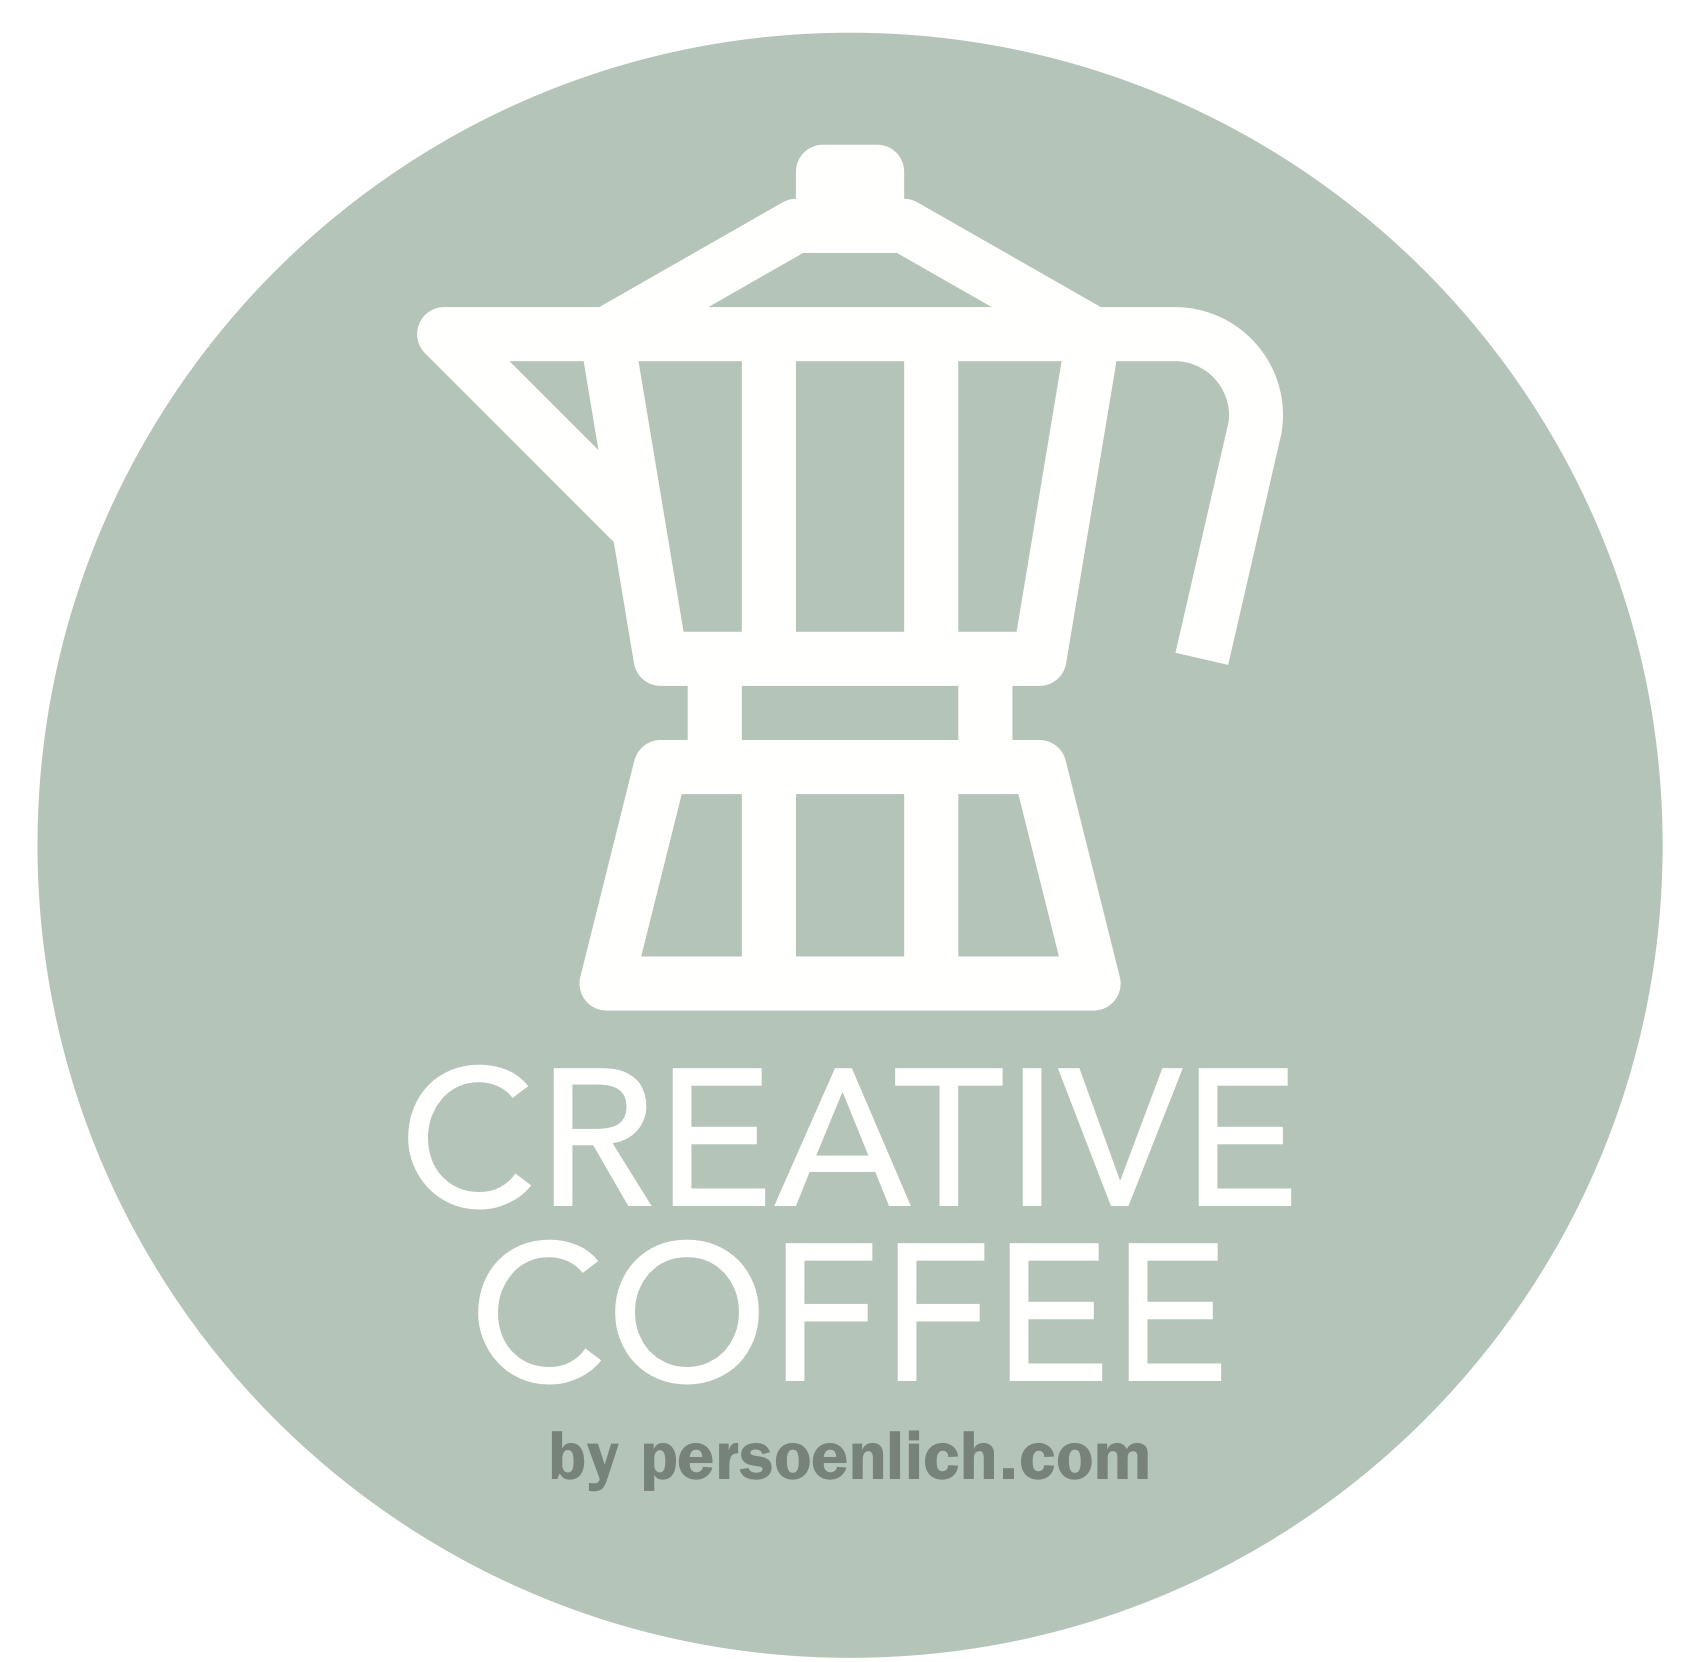 creativecoffee[1]